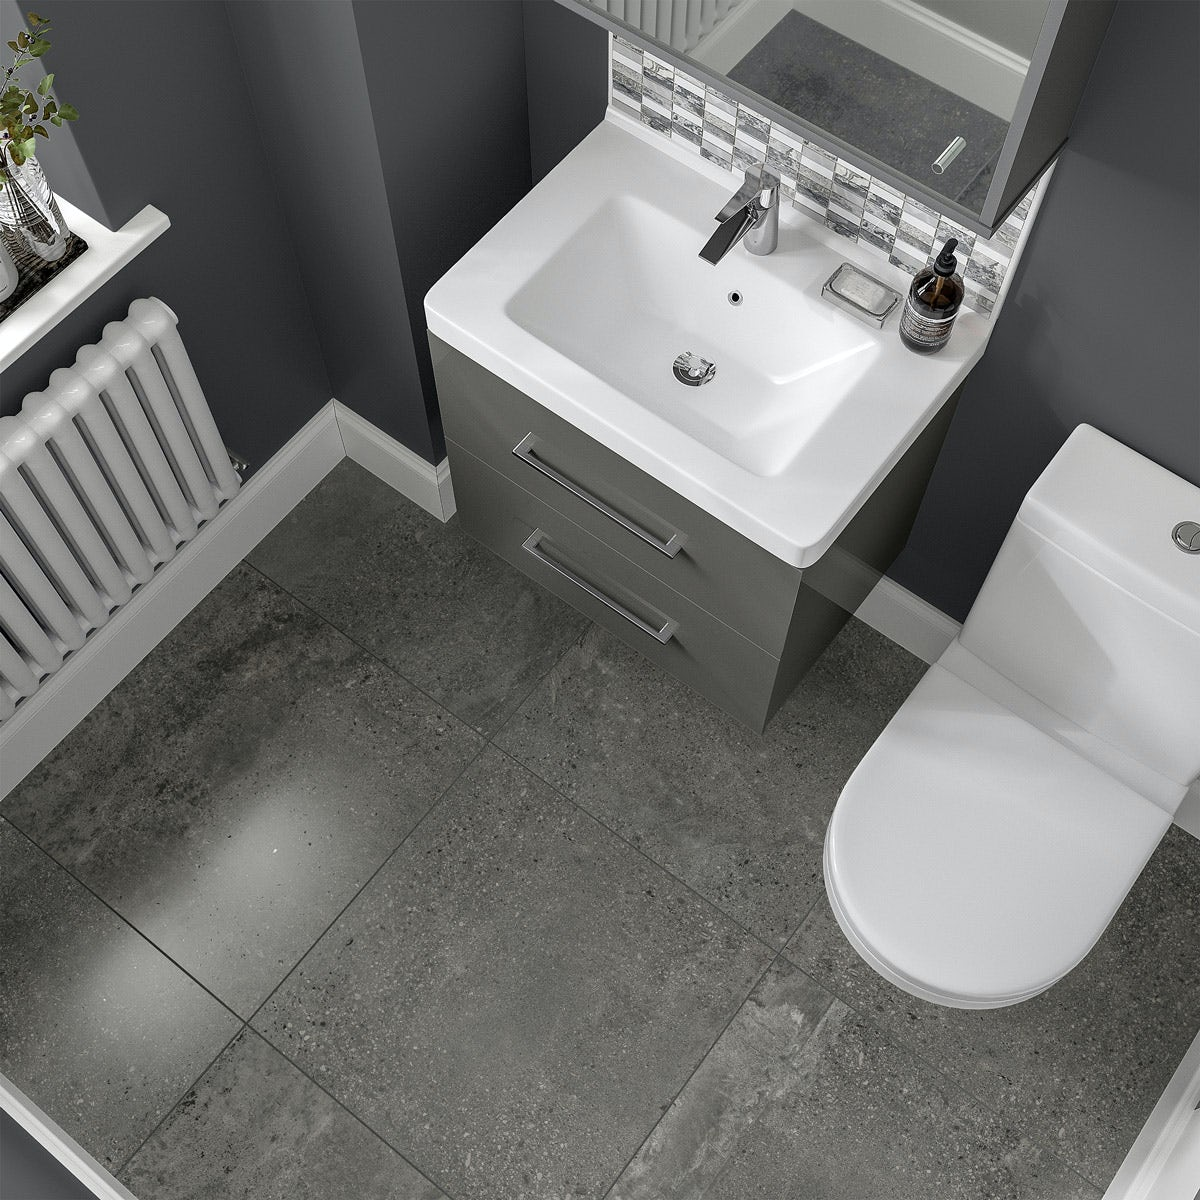 Michigan Dark Grey Stone Effect Matt Wall And Floor Tile 600mm X 600mm  VictoriaPlum.com